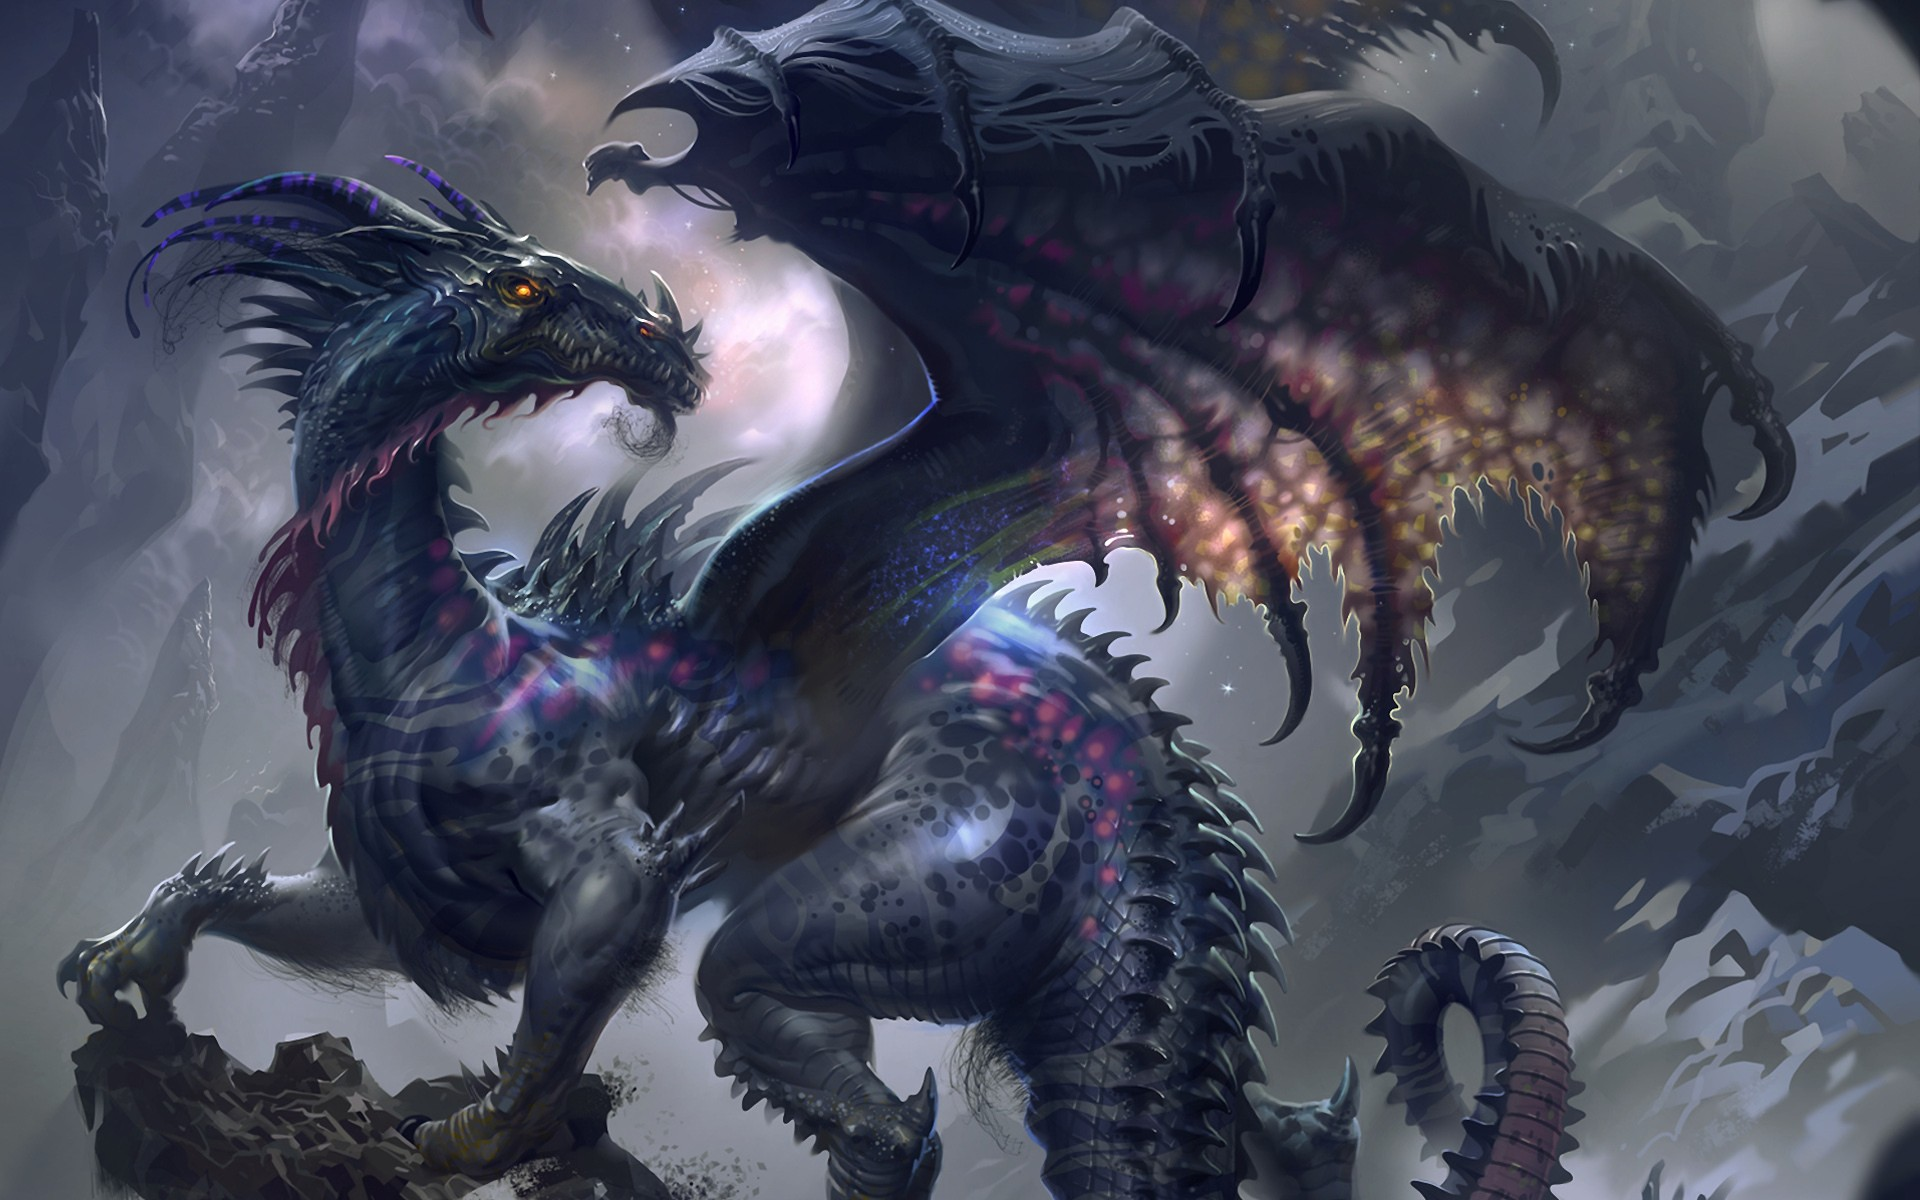 Hd wallpaper dragon - Dark Dragon Exclusive Hd Wallpapers 4298